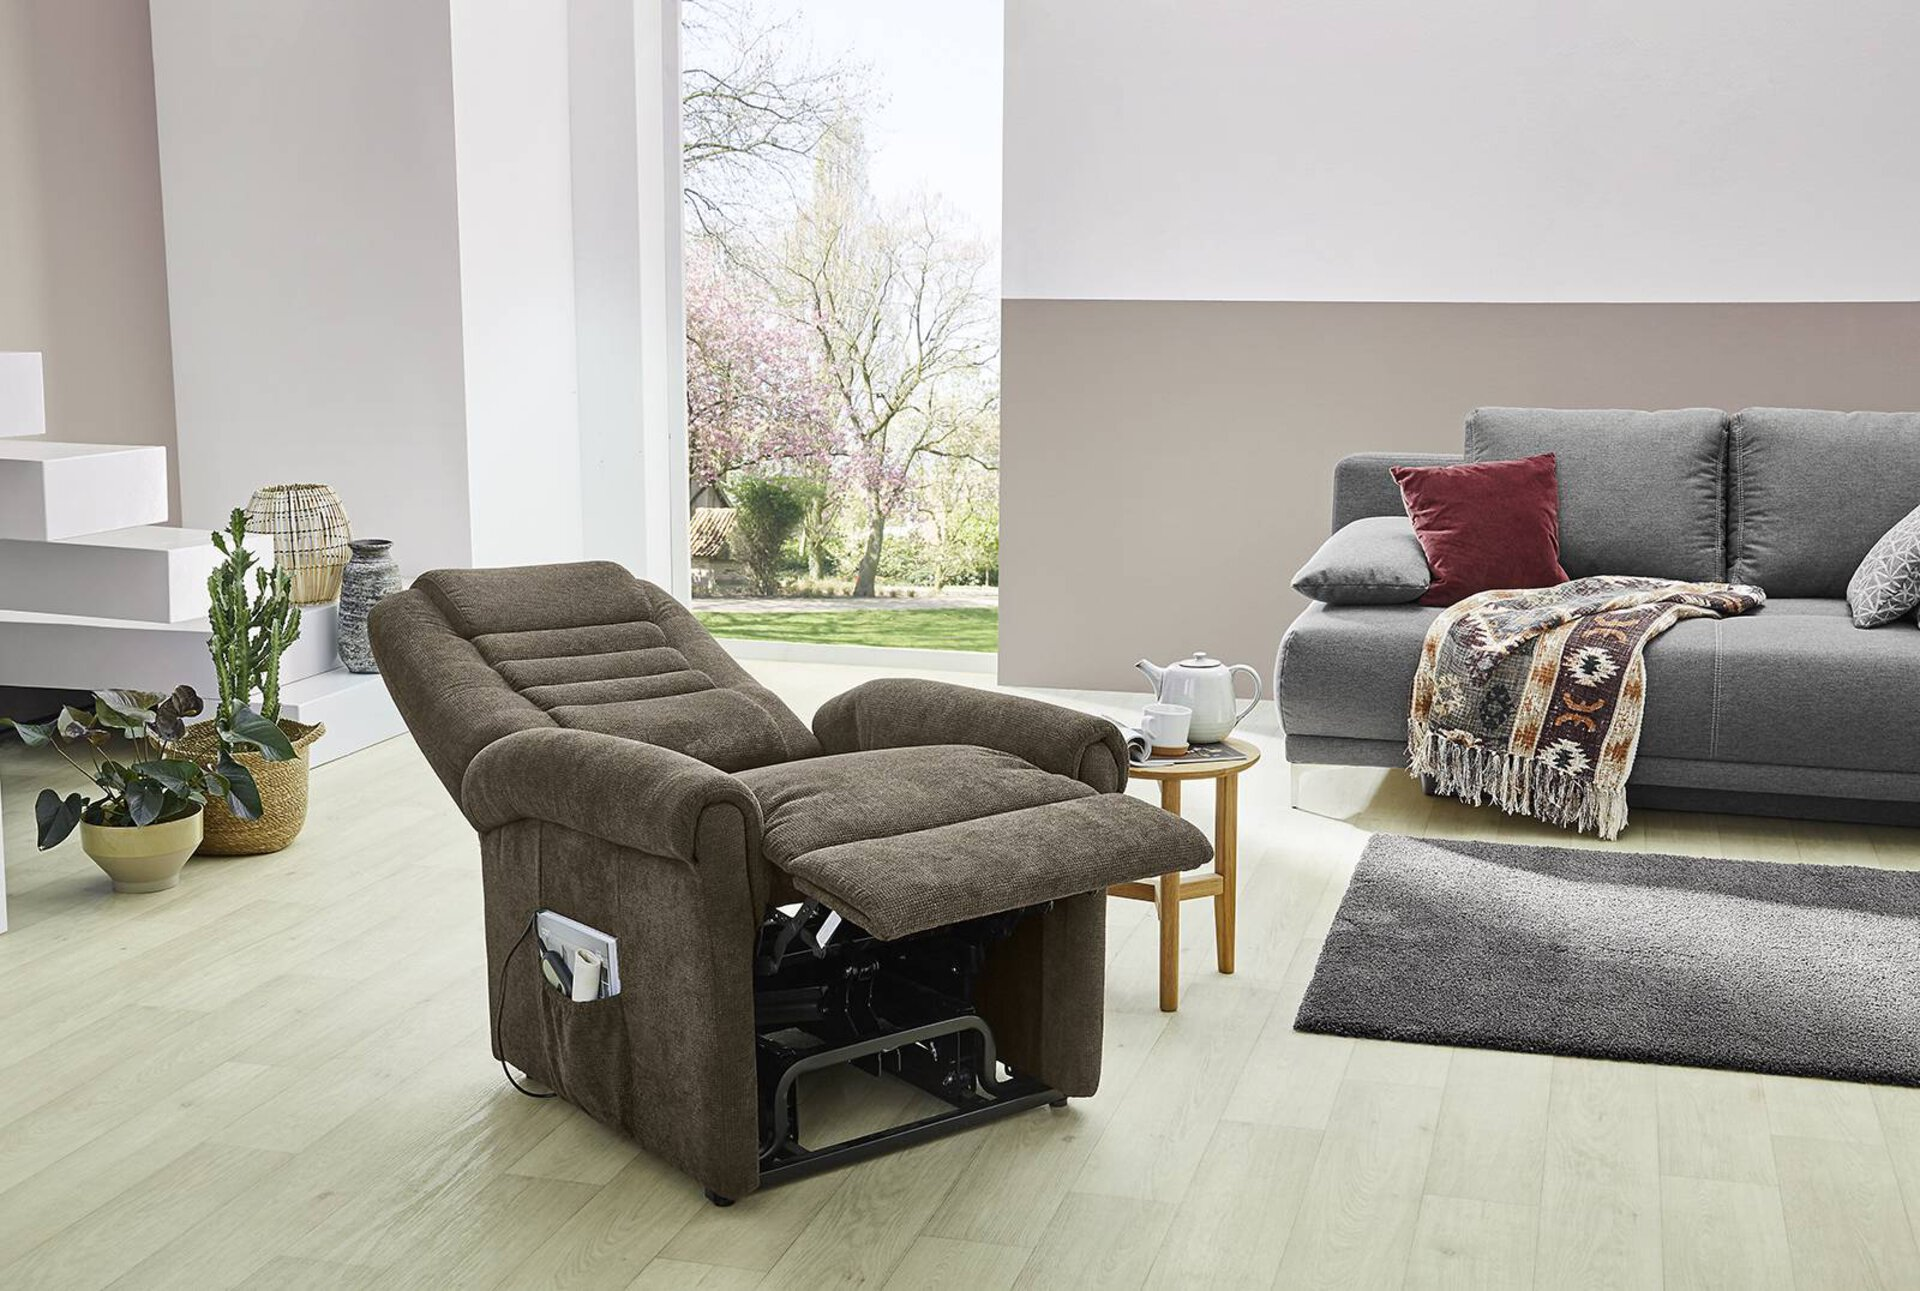 Relaxsessel OPERA CELECT Textil 84 x 113 x 77 cm